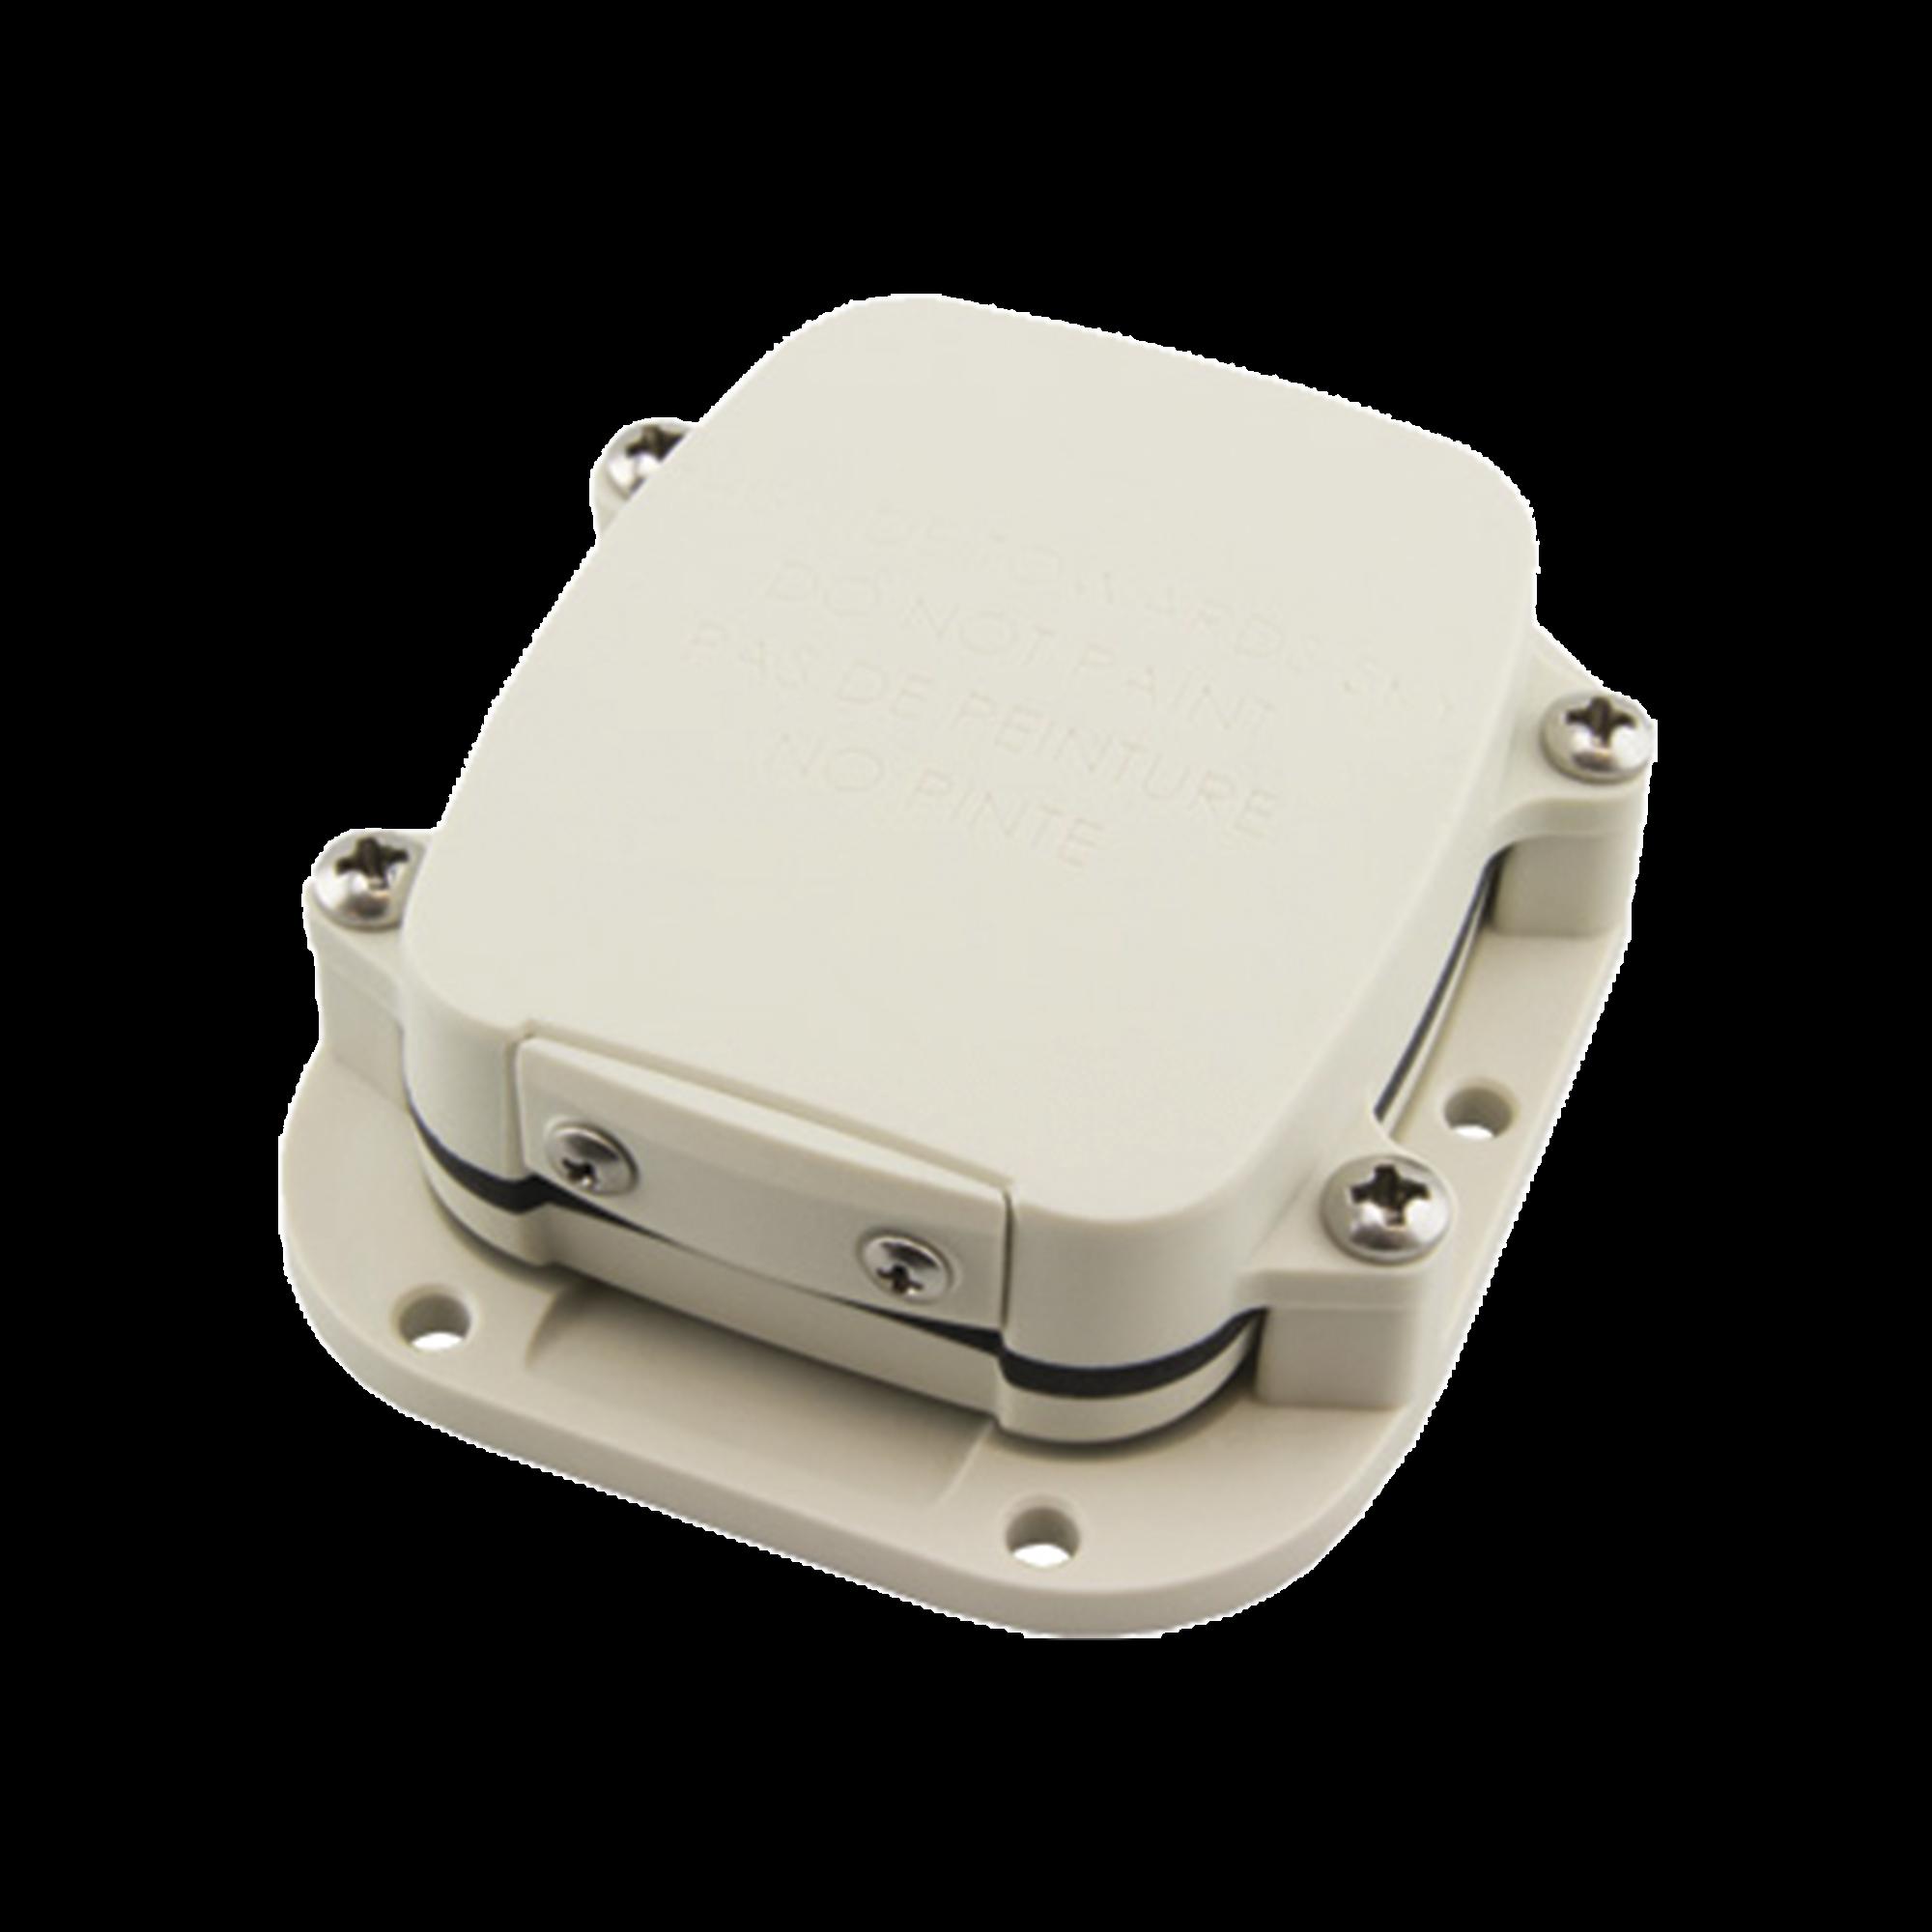 (100% SATELITAL) Rastreador Satelital, Cobertura MUNDIAL (no requiere cobertura celular),Durabilidad de bateria hasta 1.5 A�os